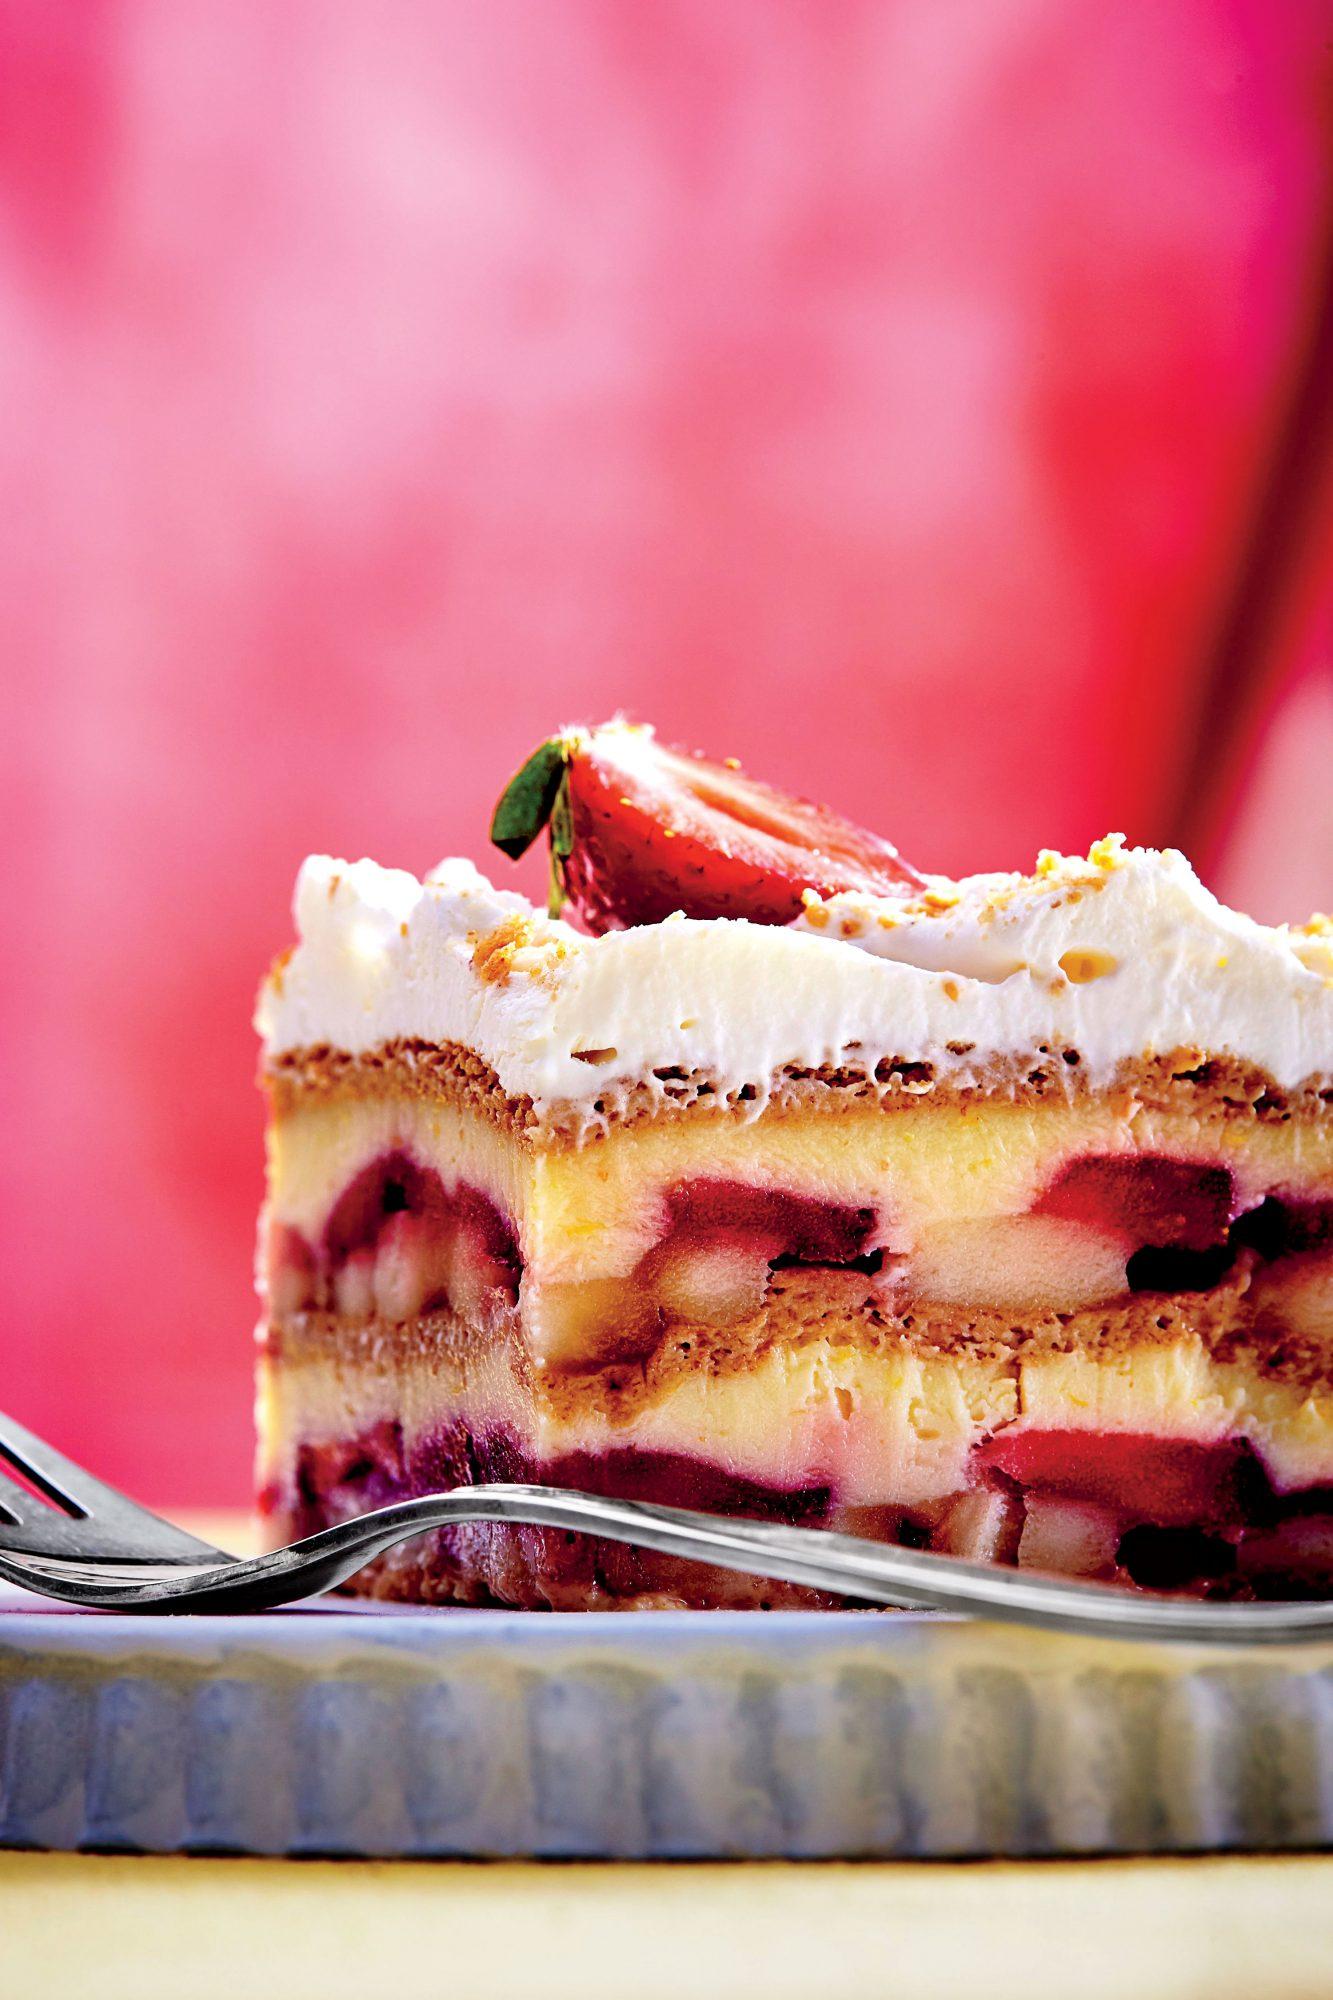 Strawberry-Banana Pudding Icebox Cake